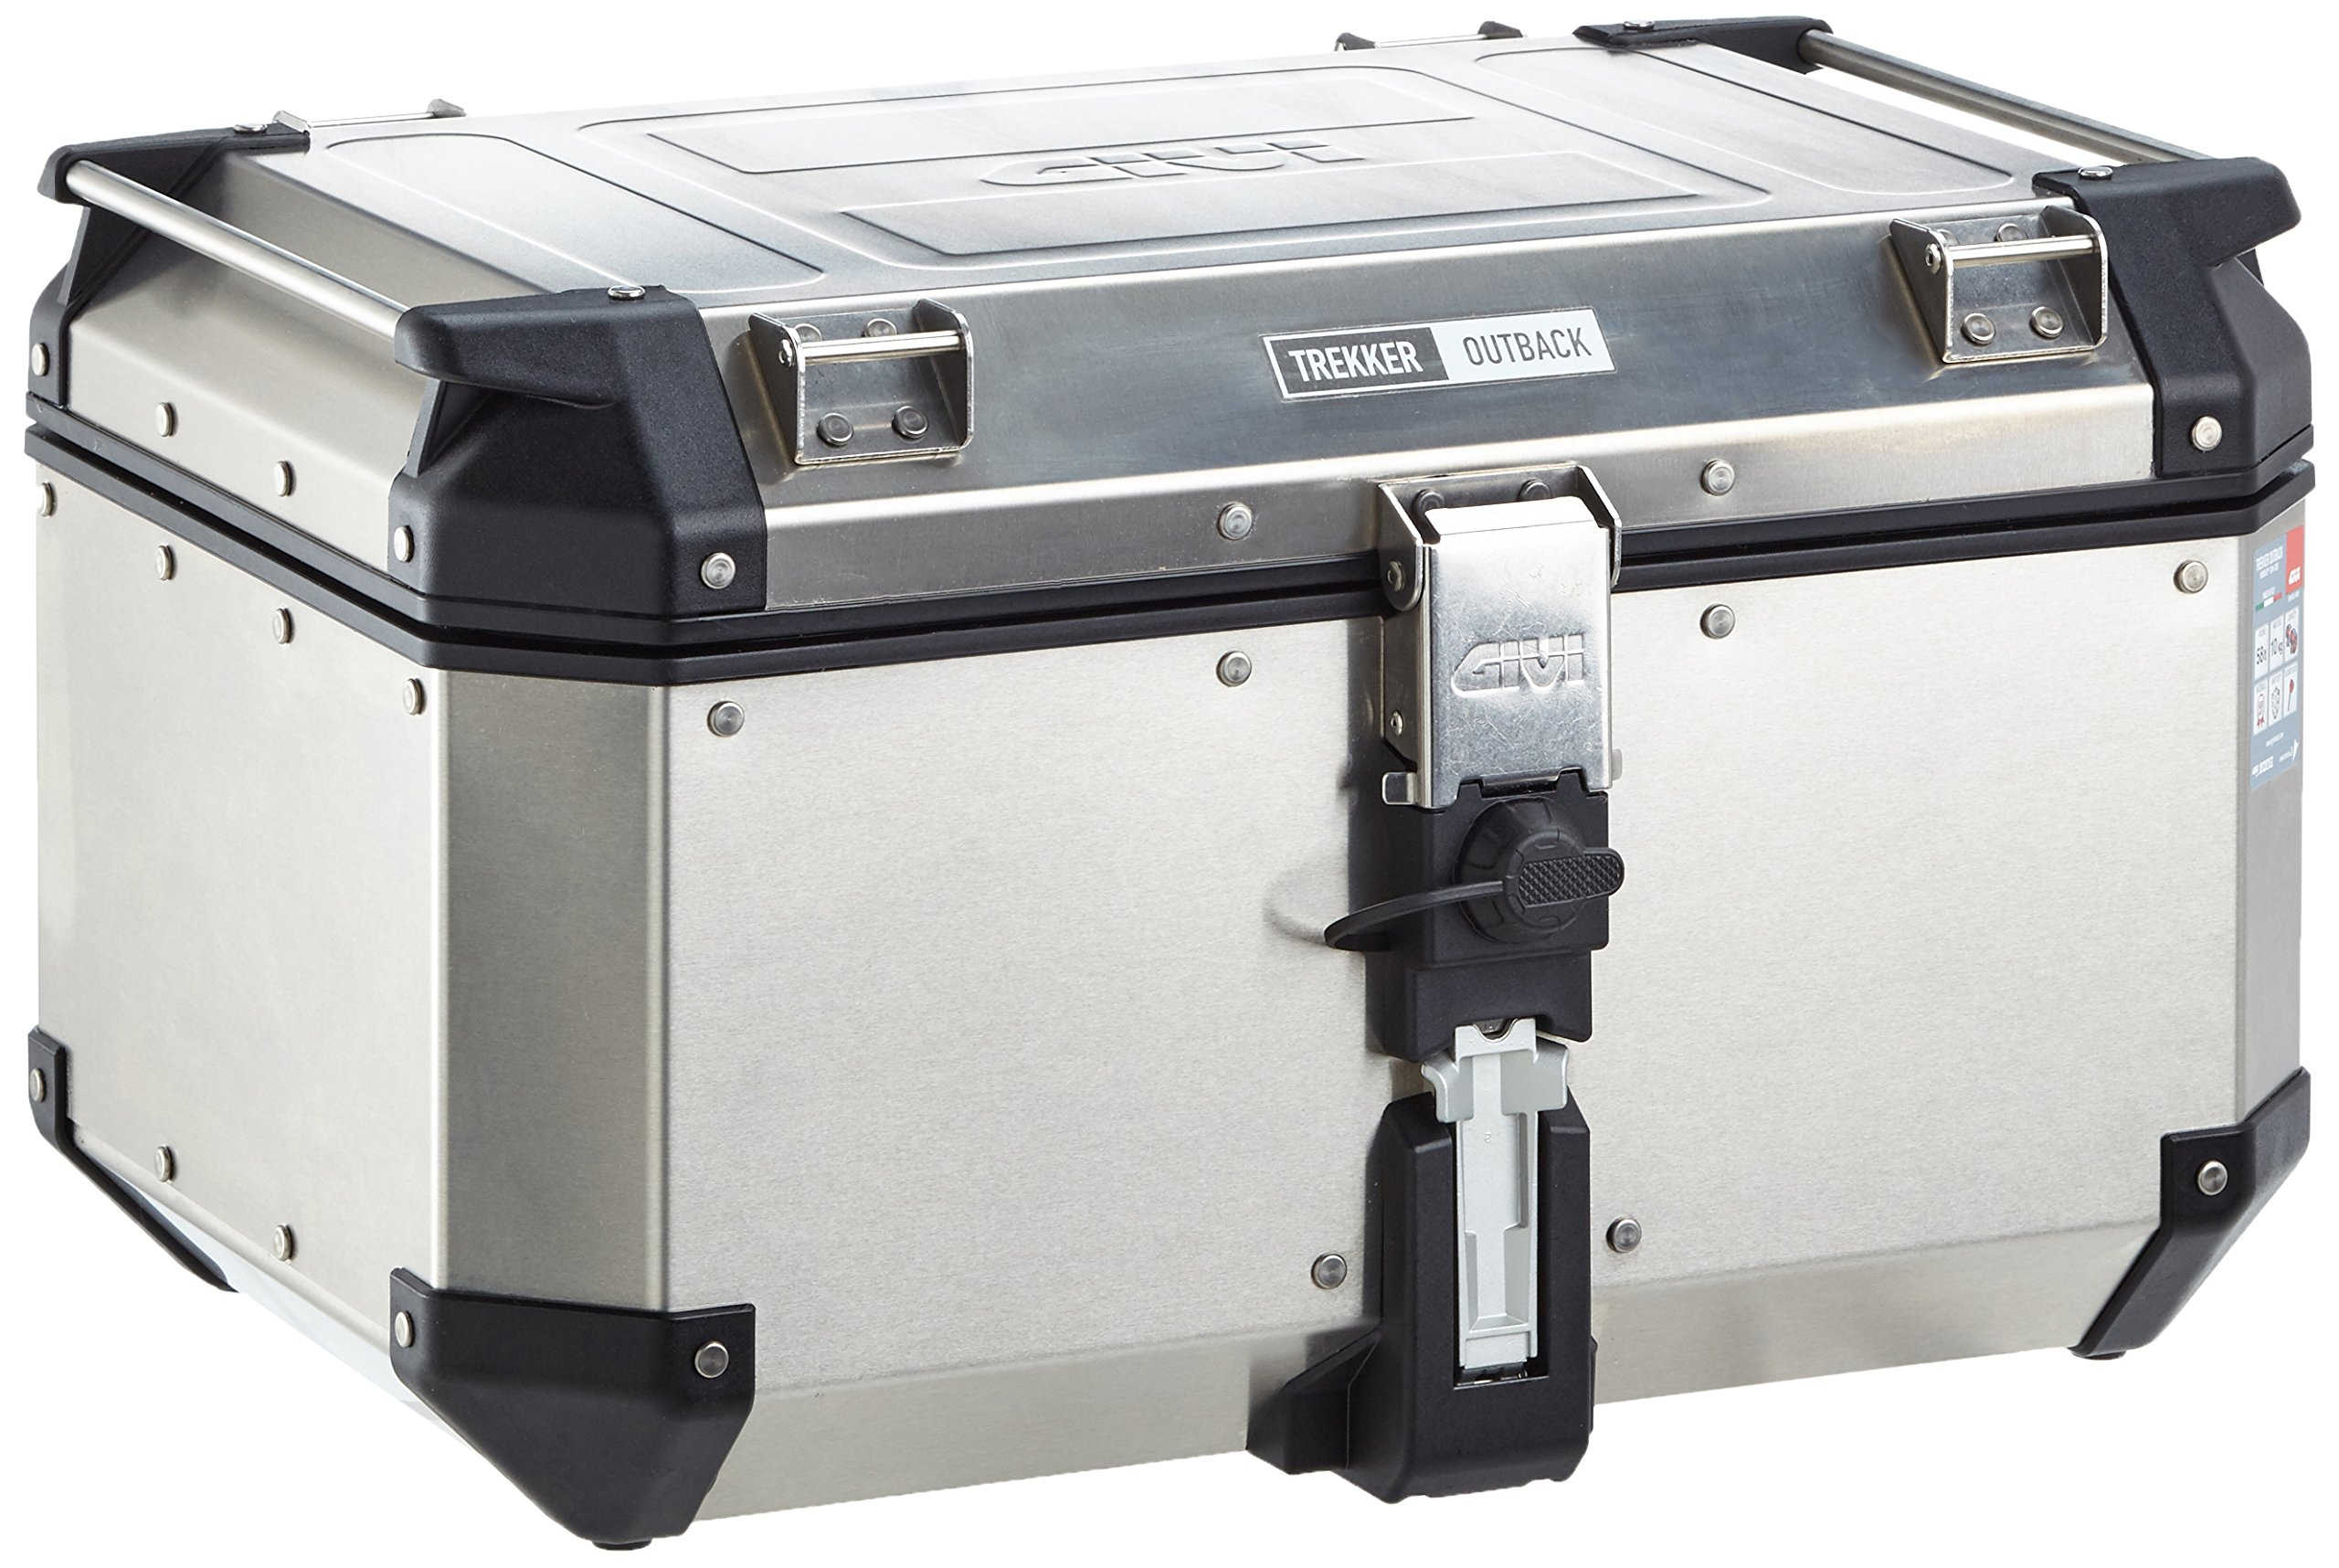 Givi OBK58A Outback Silver Top Case 58 Liter